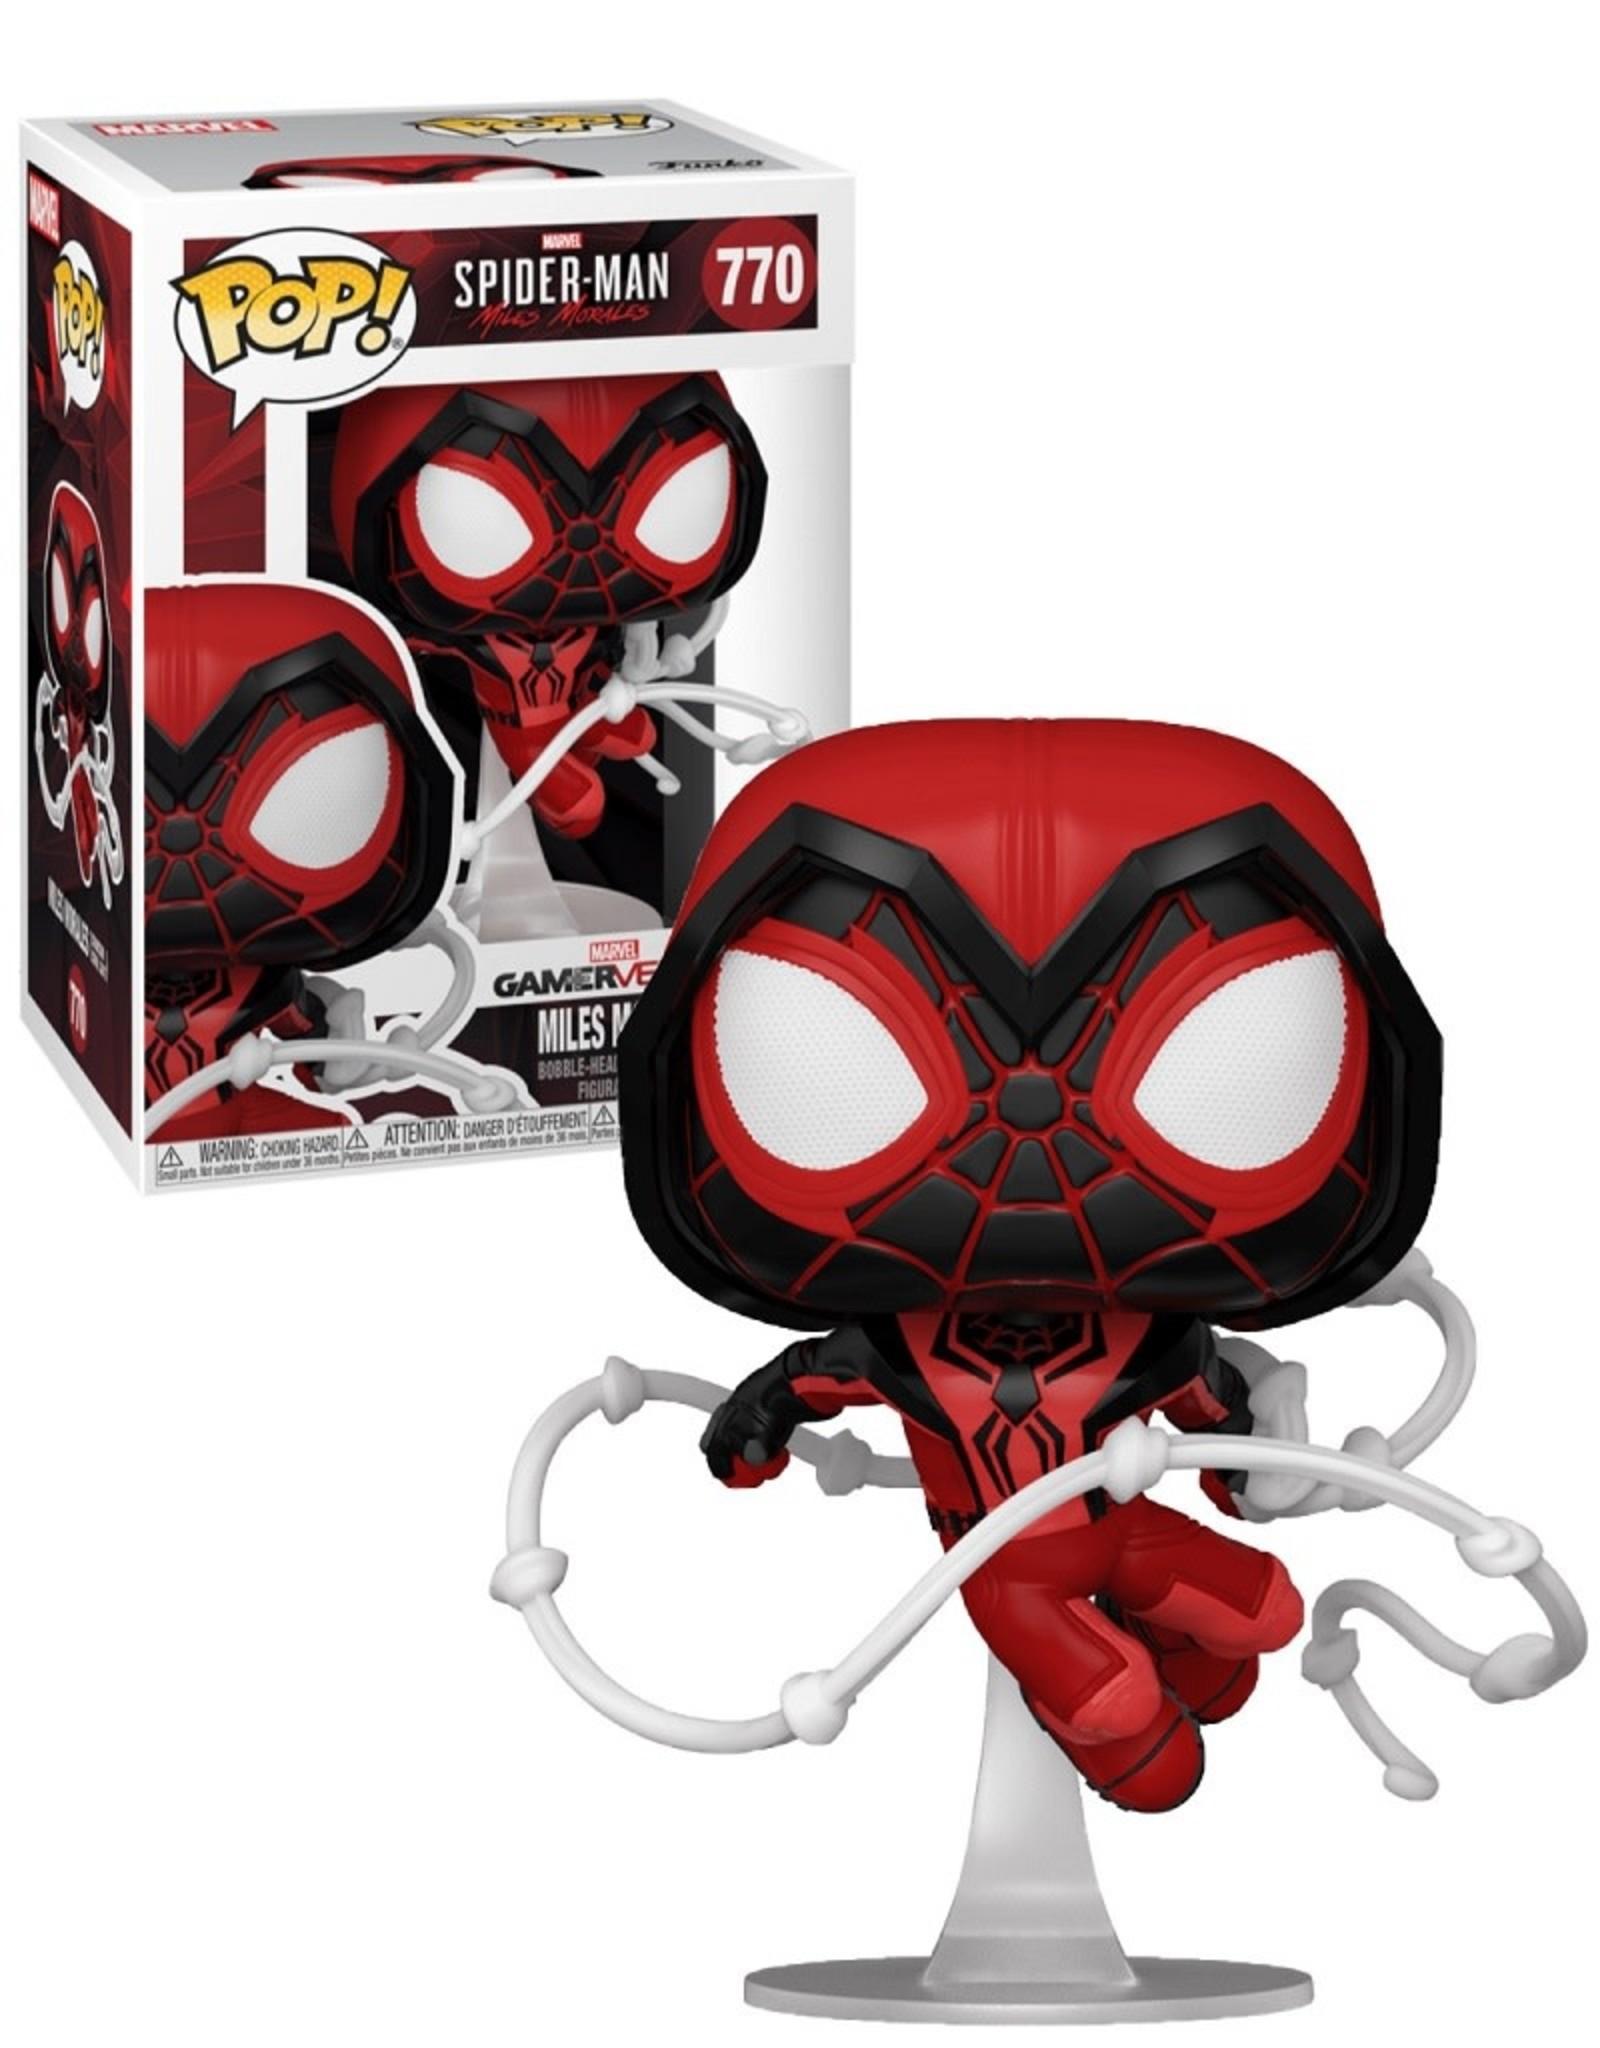 Spider-Man 770 ( Funko Pop ) Miles Morales